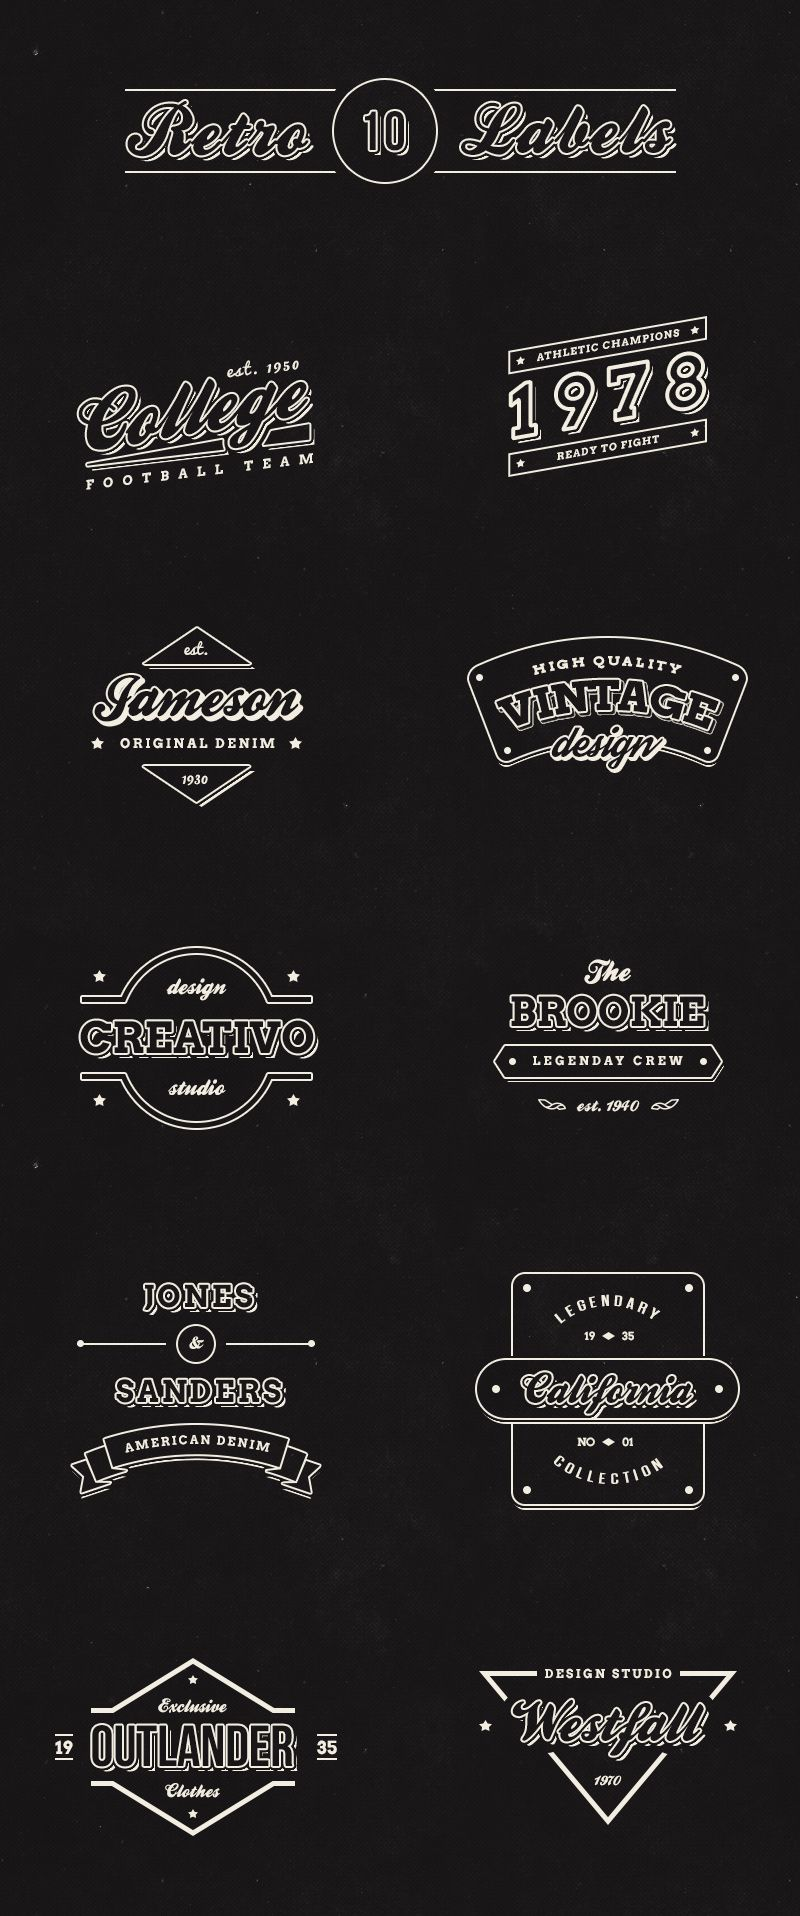 10 great #free vintage retro labels logos for designers http://webdesignledger.com/freebies/10-free-vintage-retro-labels #graphicdesign #webdesign